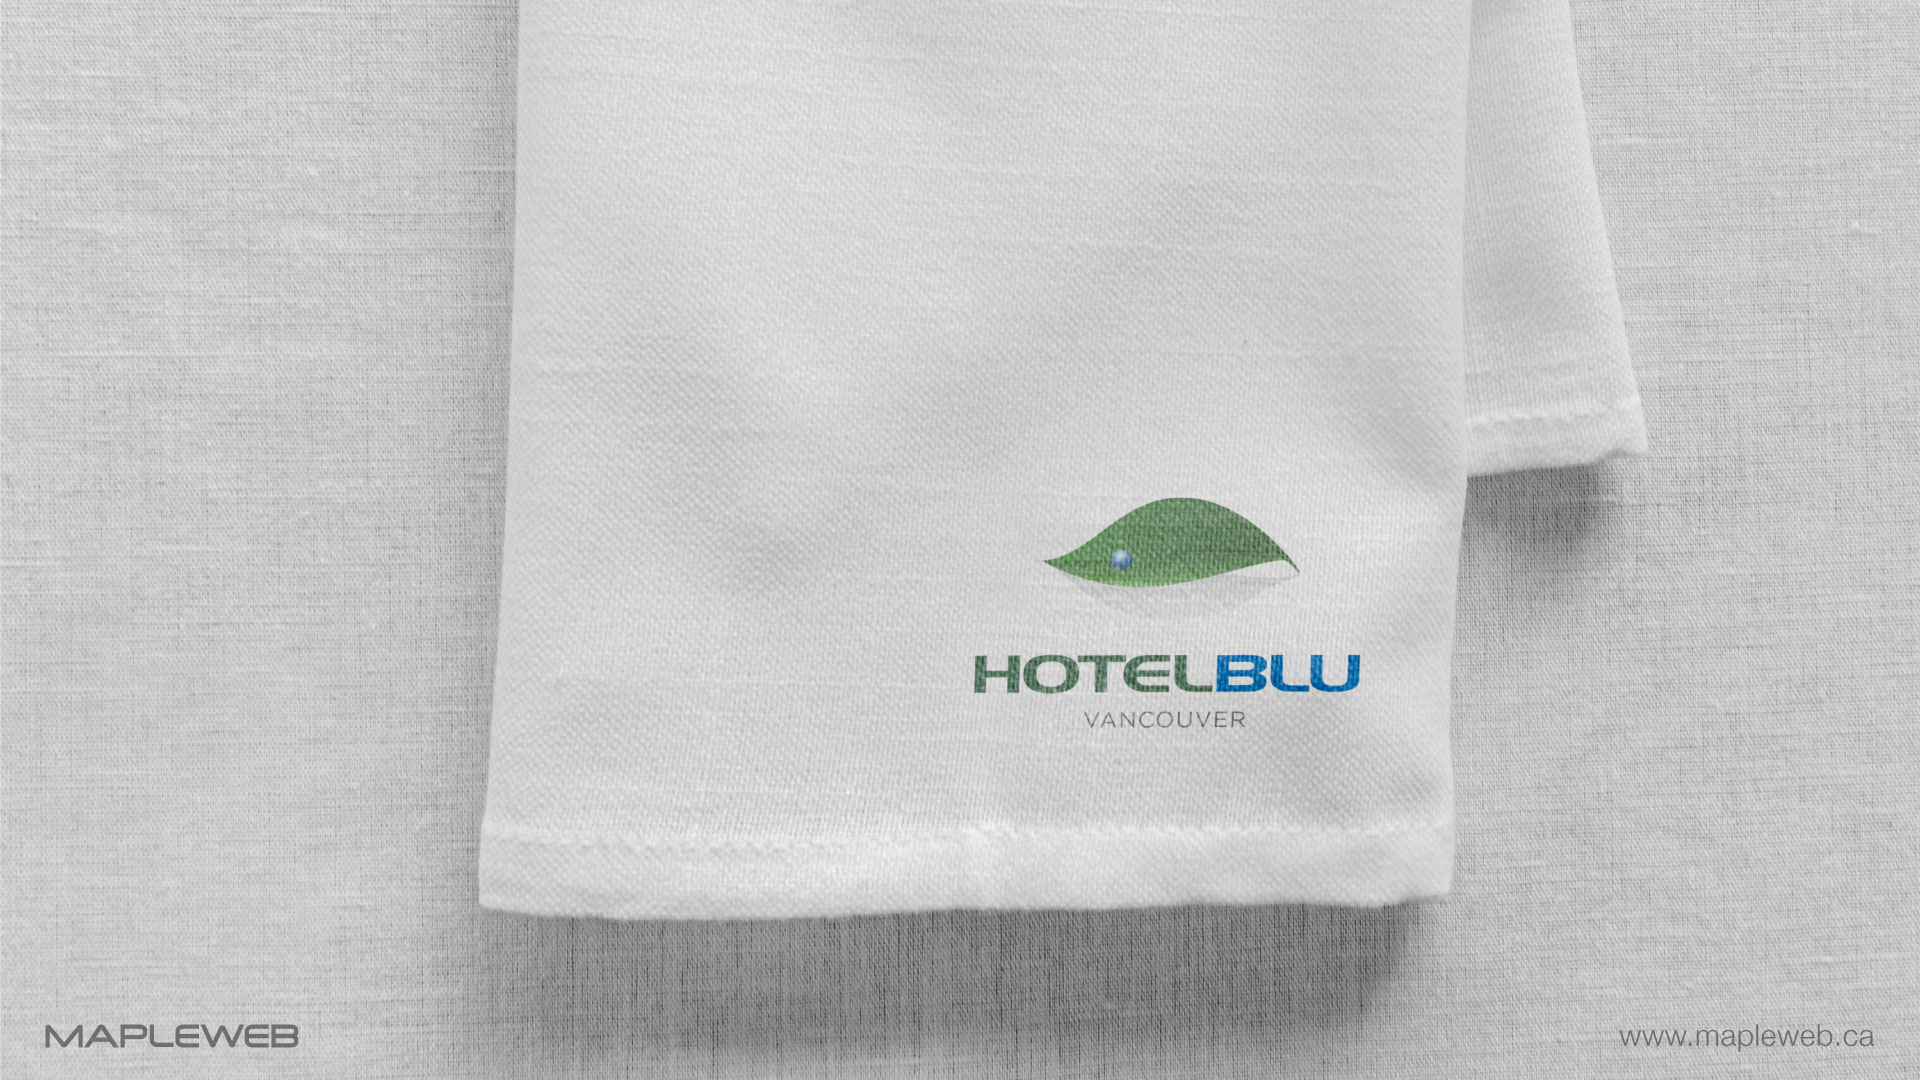 hotel-blu-brand-logo-design-by-mapleweb-vancouver-canada-white-towel-mock